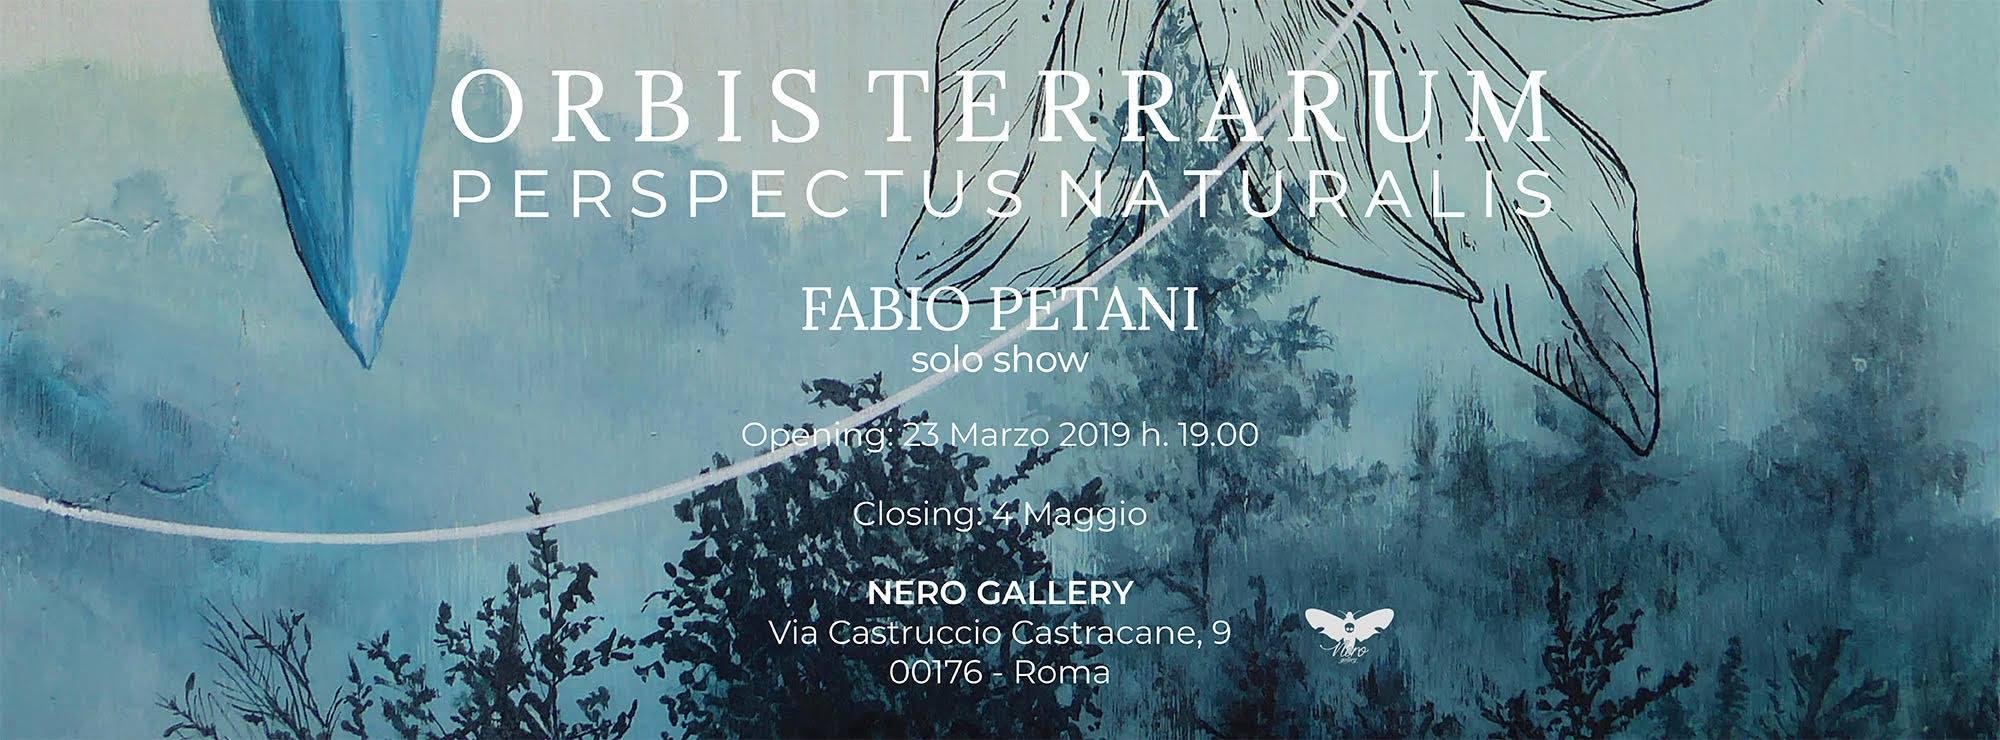 Orbis Terrarum Perspectus Naturalis | Mostra personale di Fabio Petani